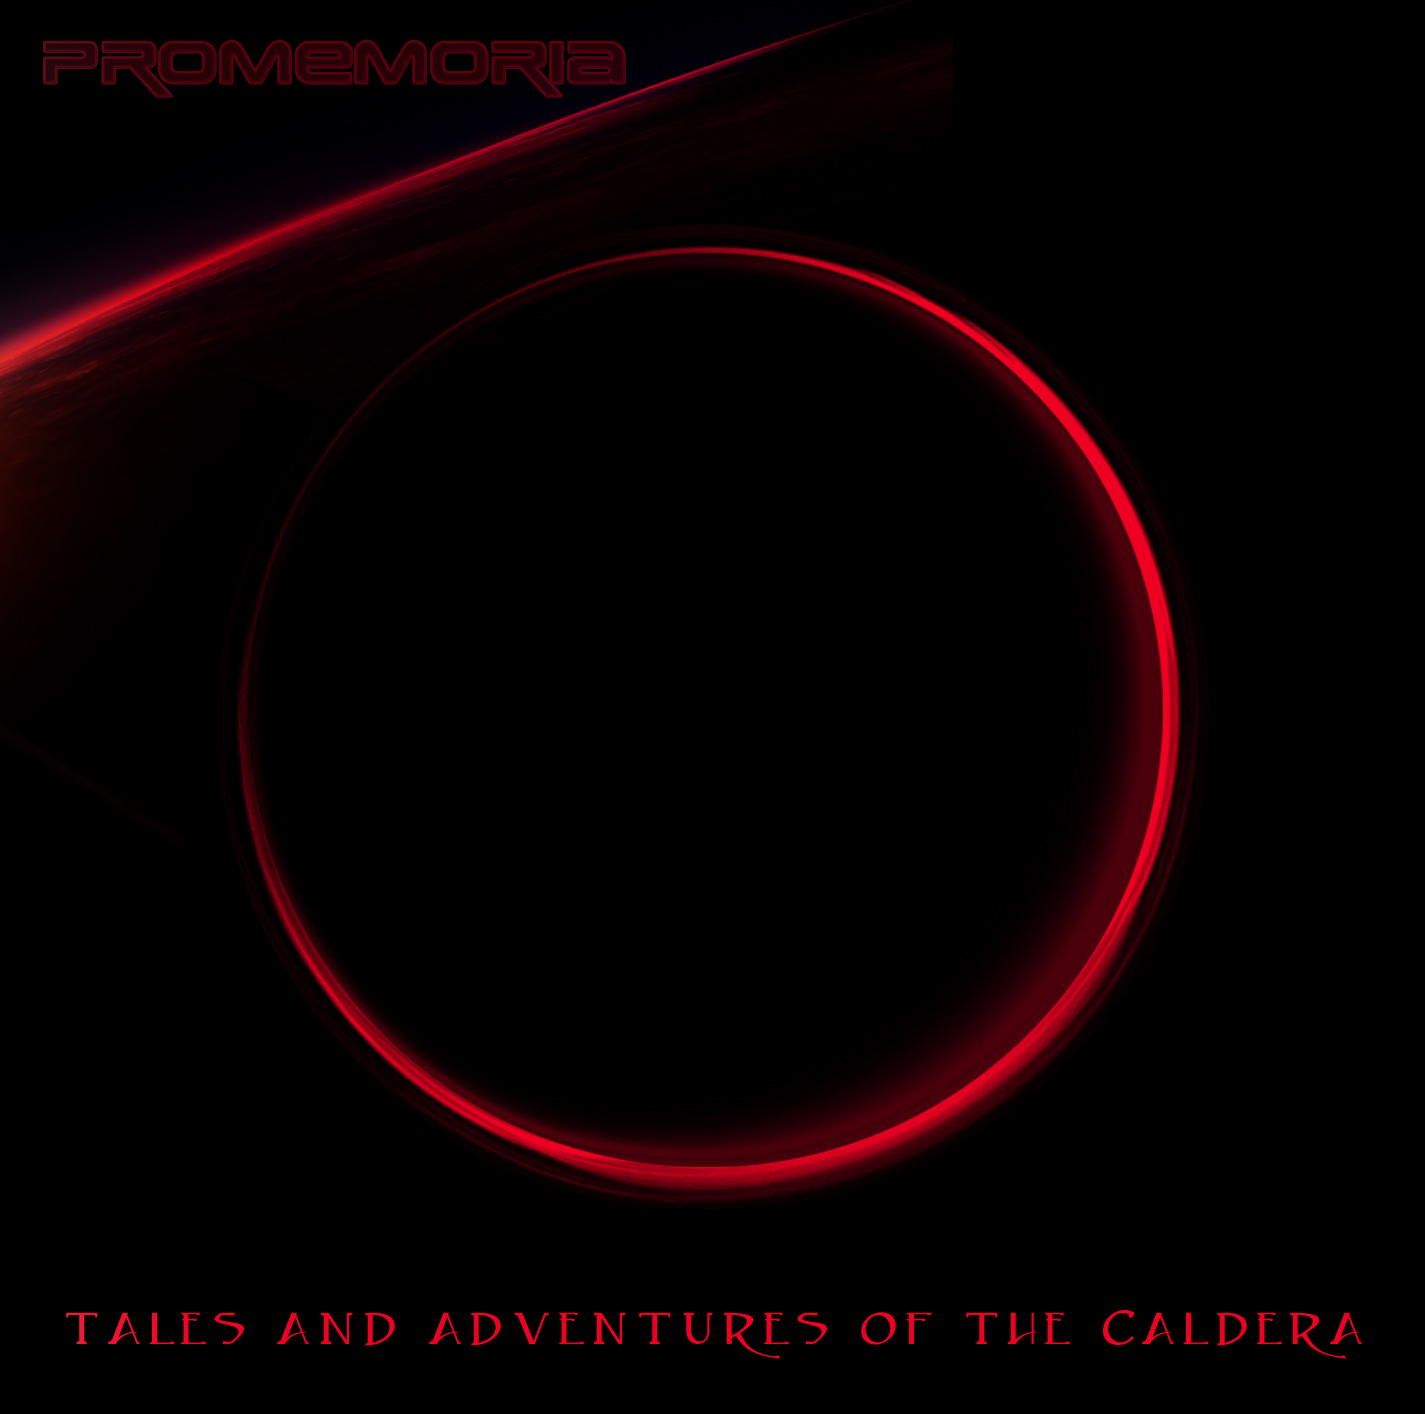 Caldera CD cover